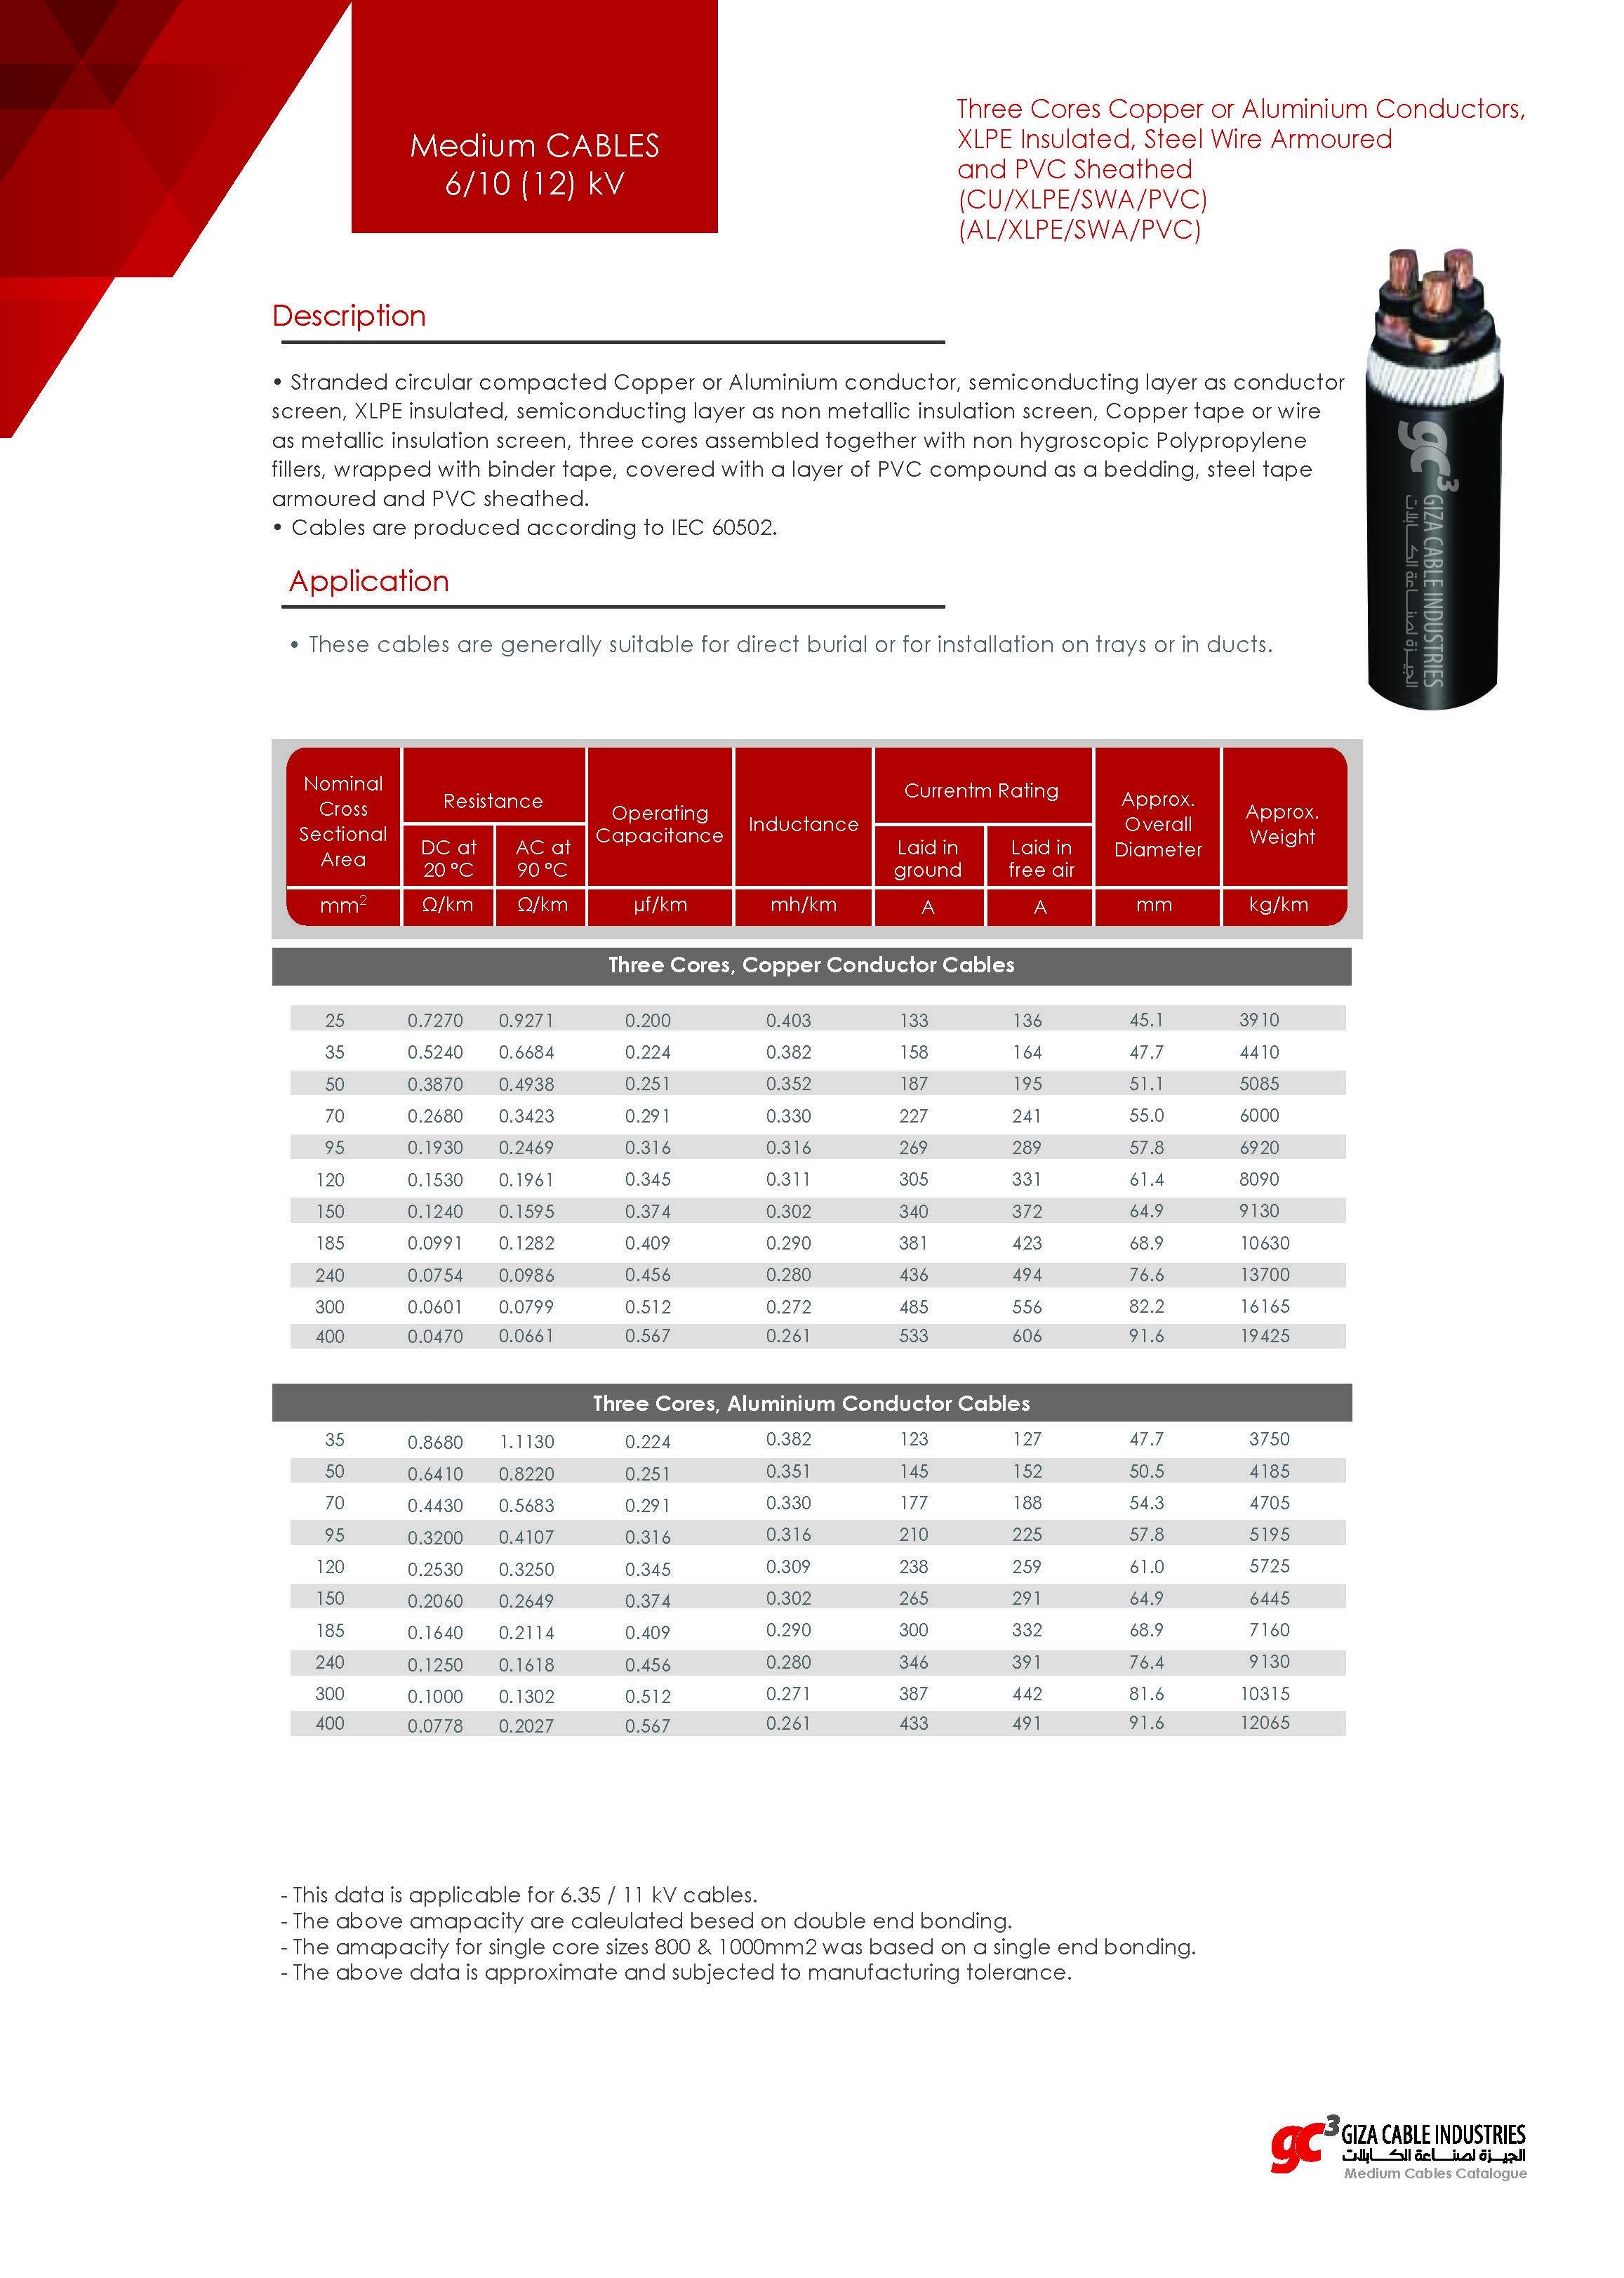 Medium CABLES 6/10 (12) kV - (CU/XLPE/SWA/PVC) - (AL/XLPE/SWA/PVC)